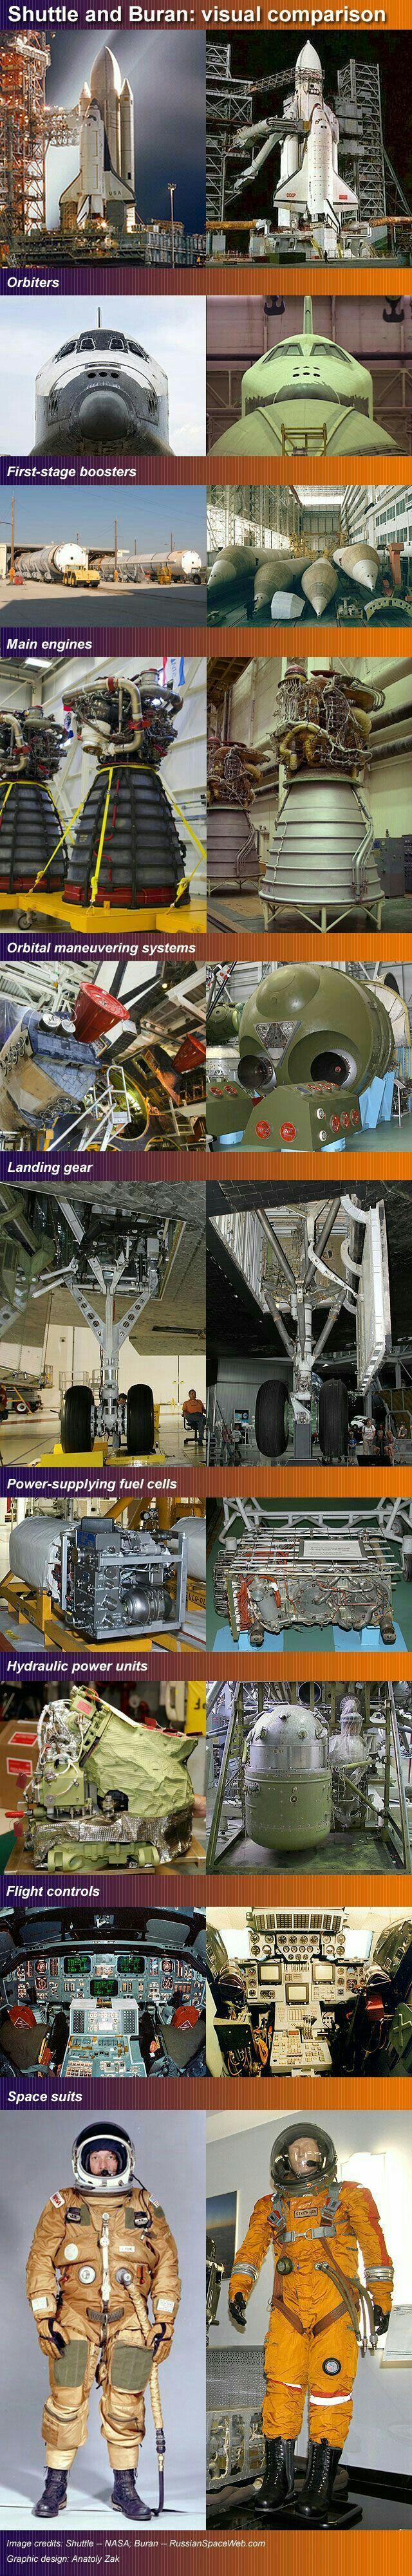 NASA, Space Shuttle & Buran, Russian Space Shuttle.